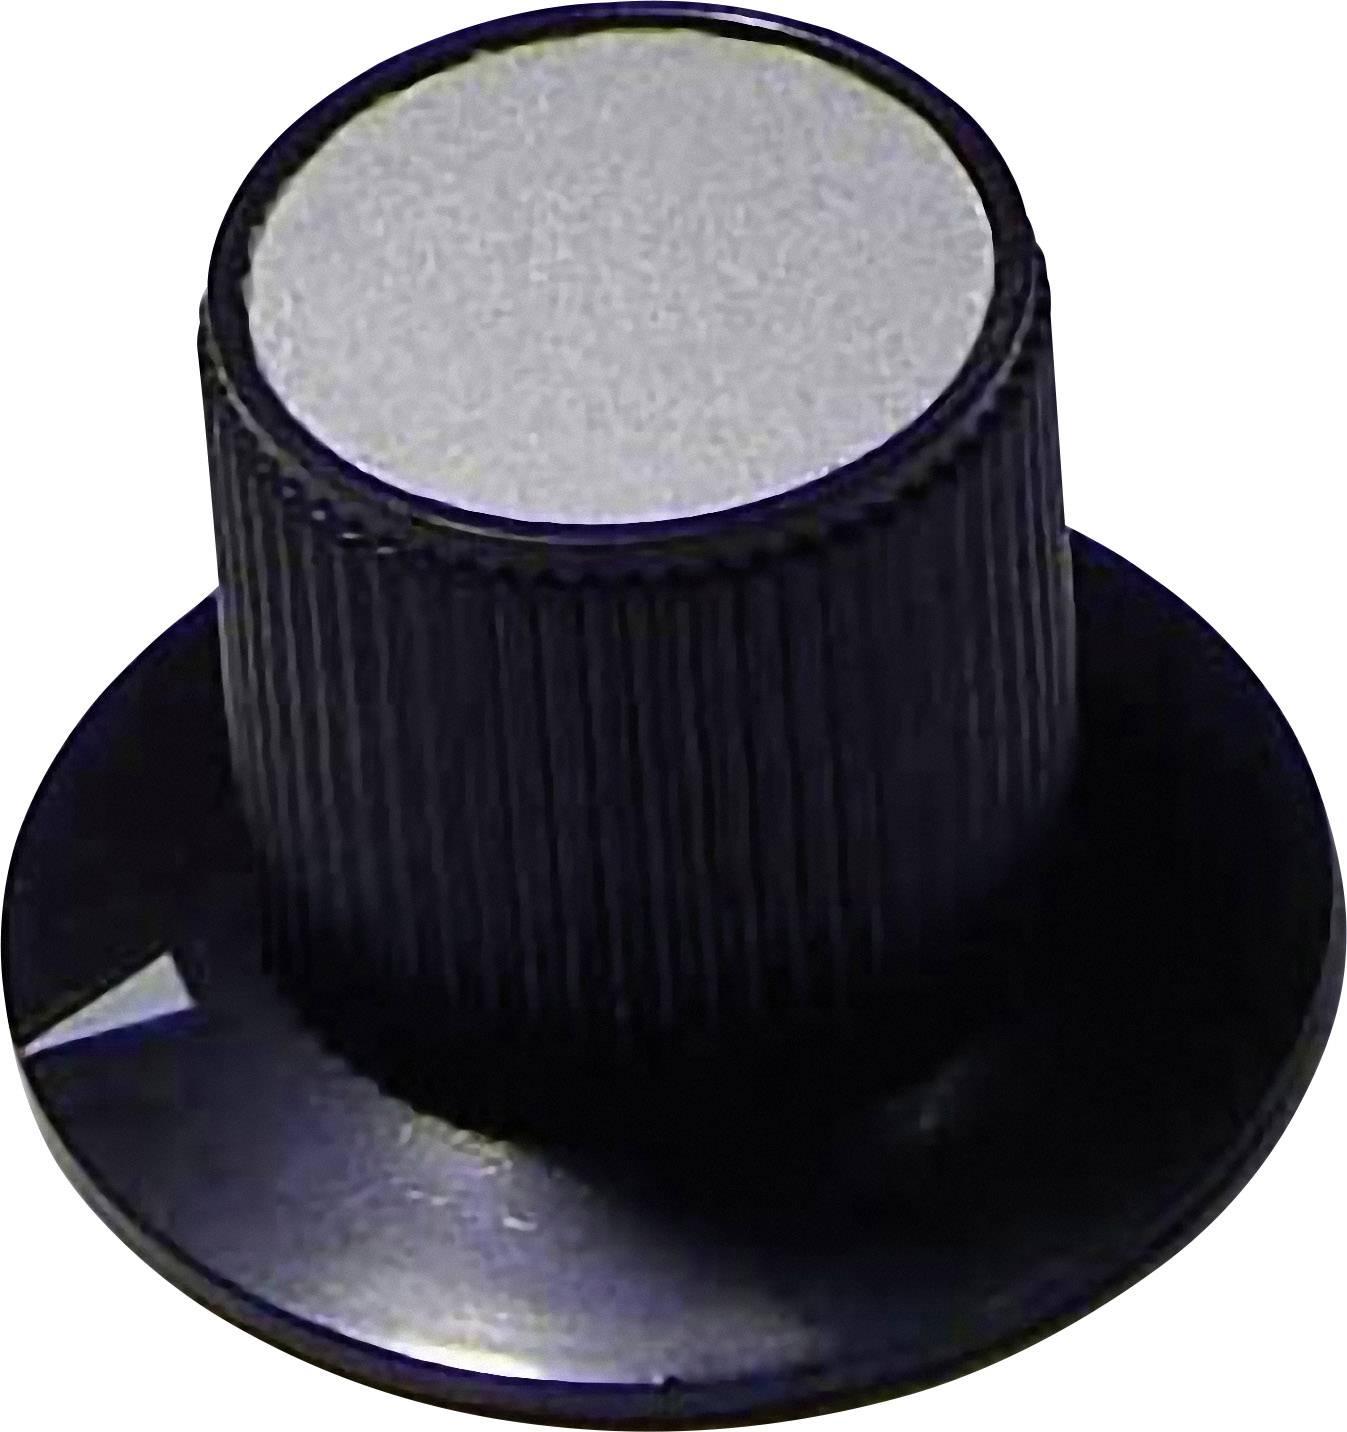 Otočný knoflík TRU COMPONENTS 29/17, (Ø x v) 29 mm x 20 mm, černá, 1 ks